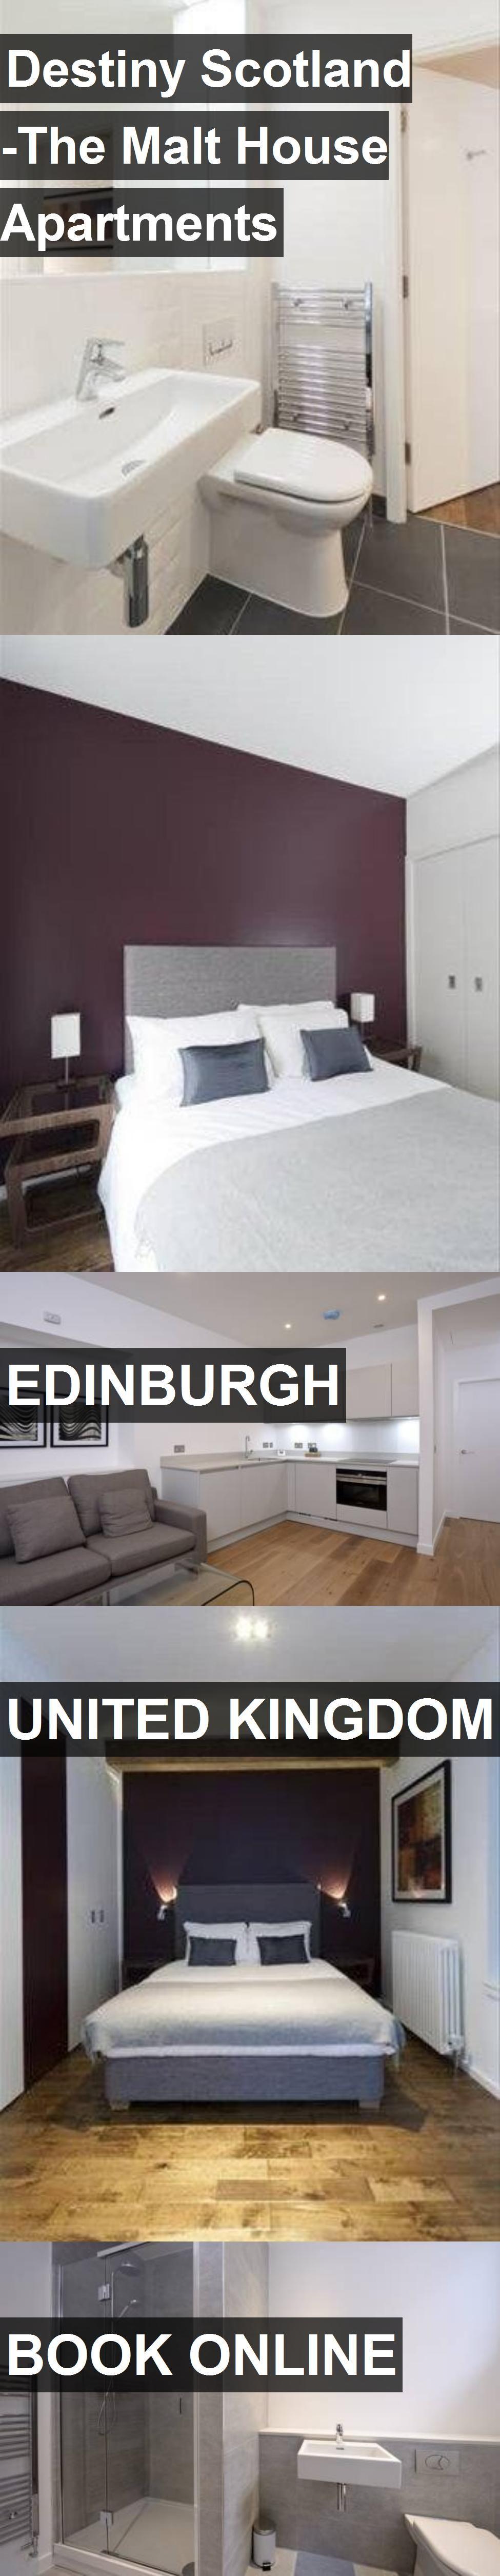 Destiny Scotland -The Malt House Apartments in Edinburgh ...